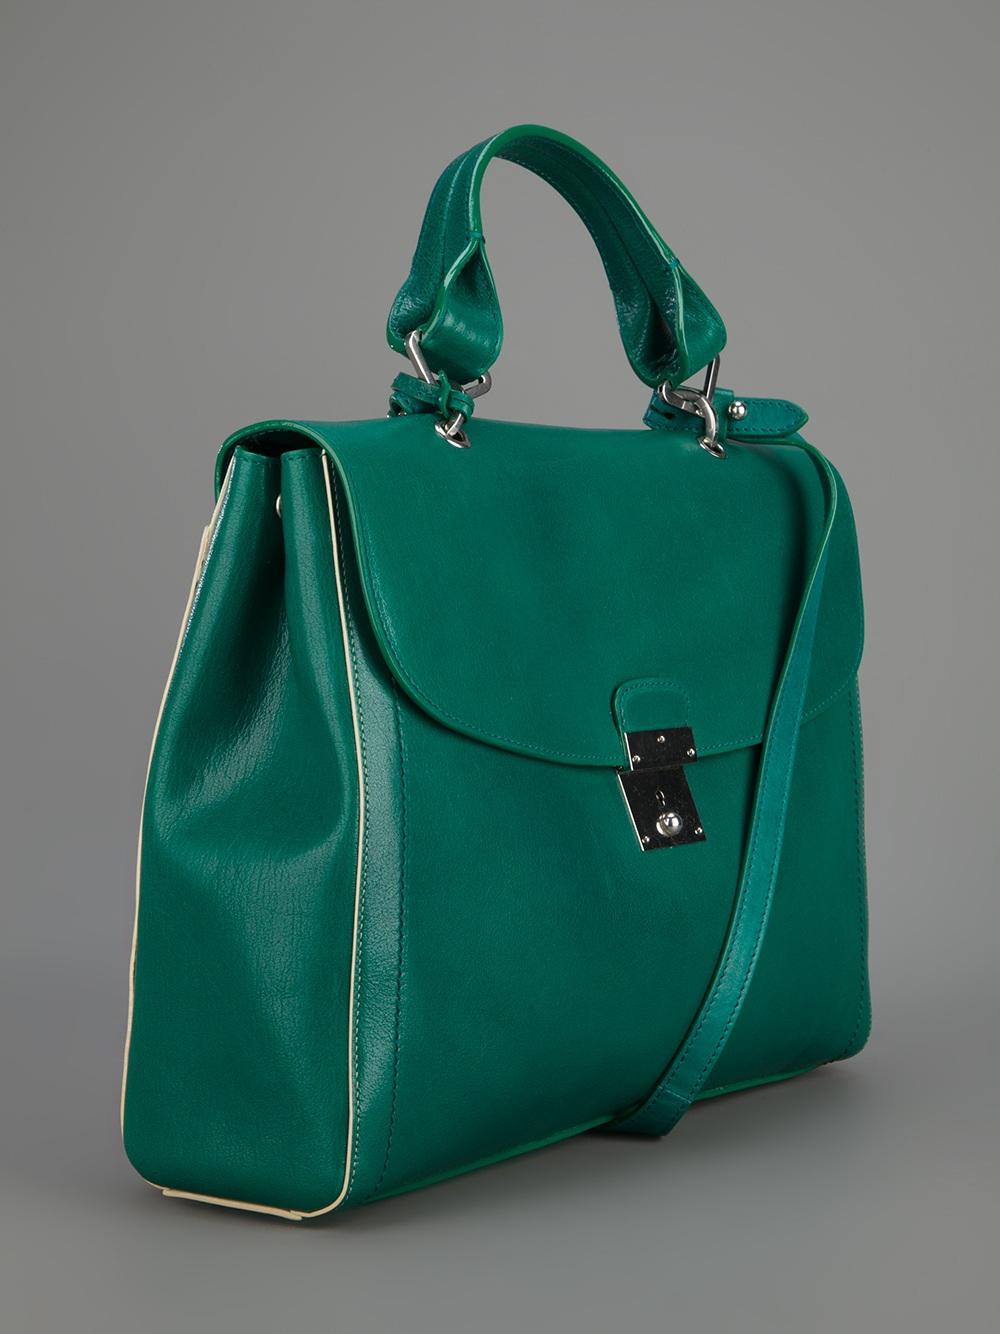 Marc Jacobs Padlock Tote Bag in Green